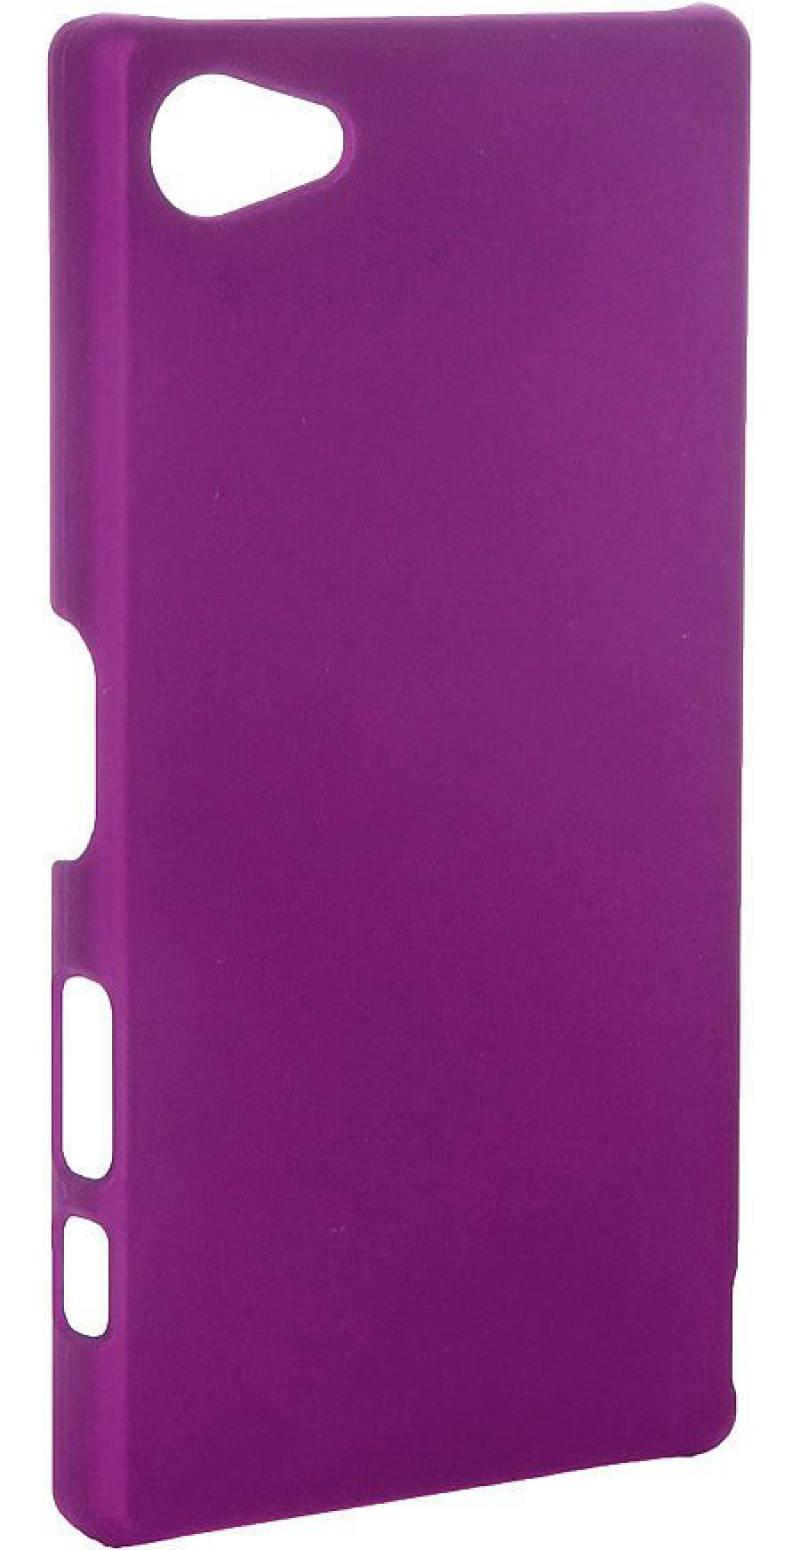 все цены на Чехол-накладка Pulsar CLIPCASE PC Soft-Touch для Sony Z5 Compact (фиолетовая) РСС0140 онлайн